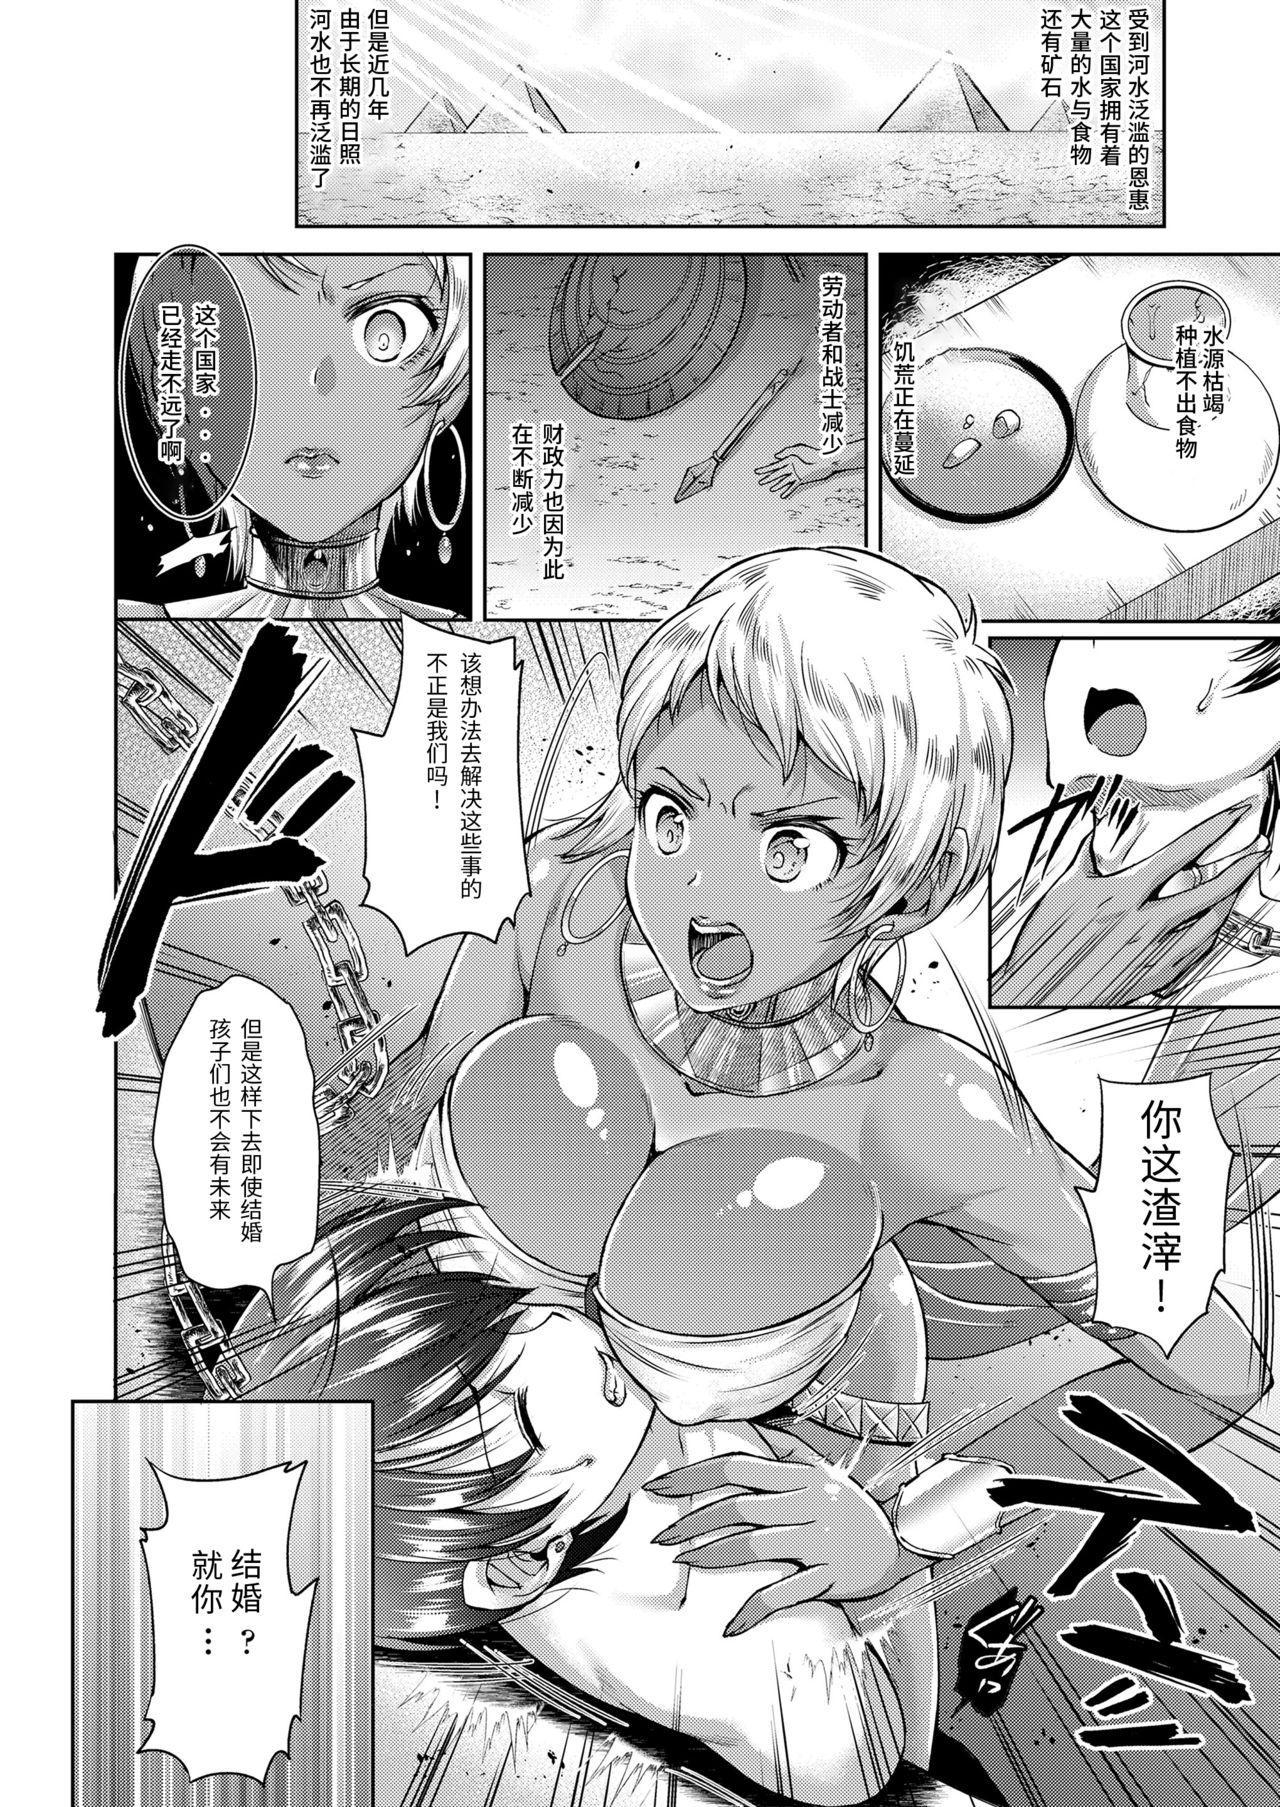 Nigasanai Hanasanai EXODUS 4